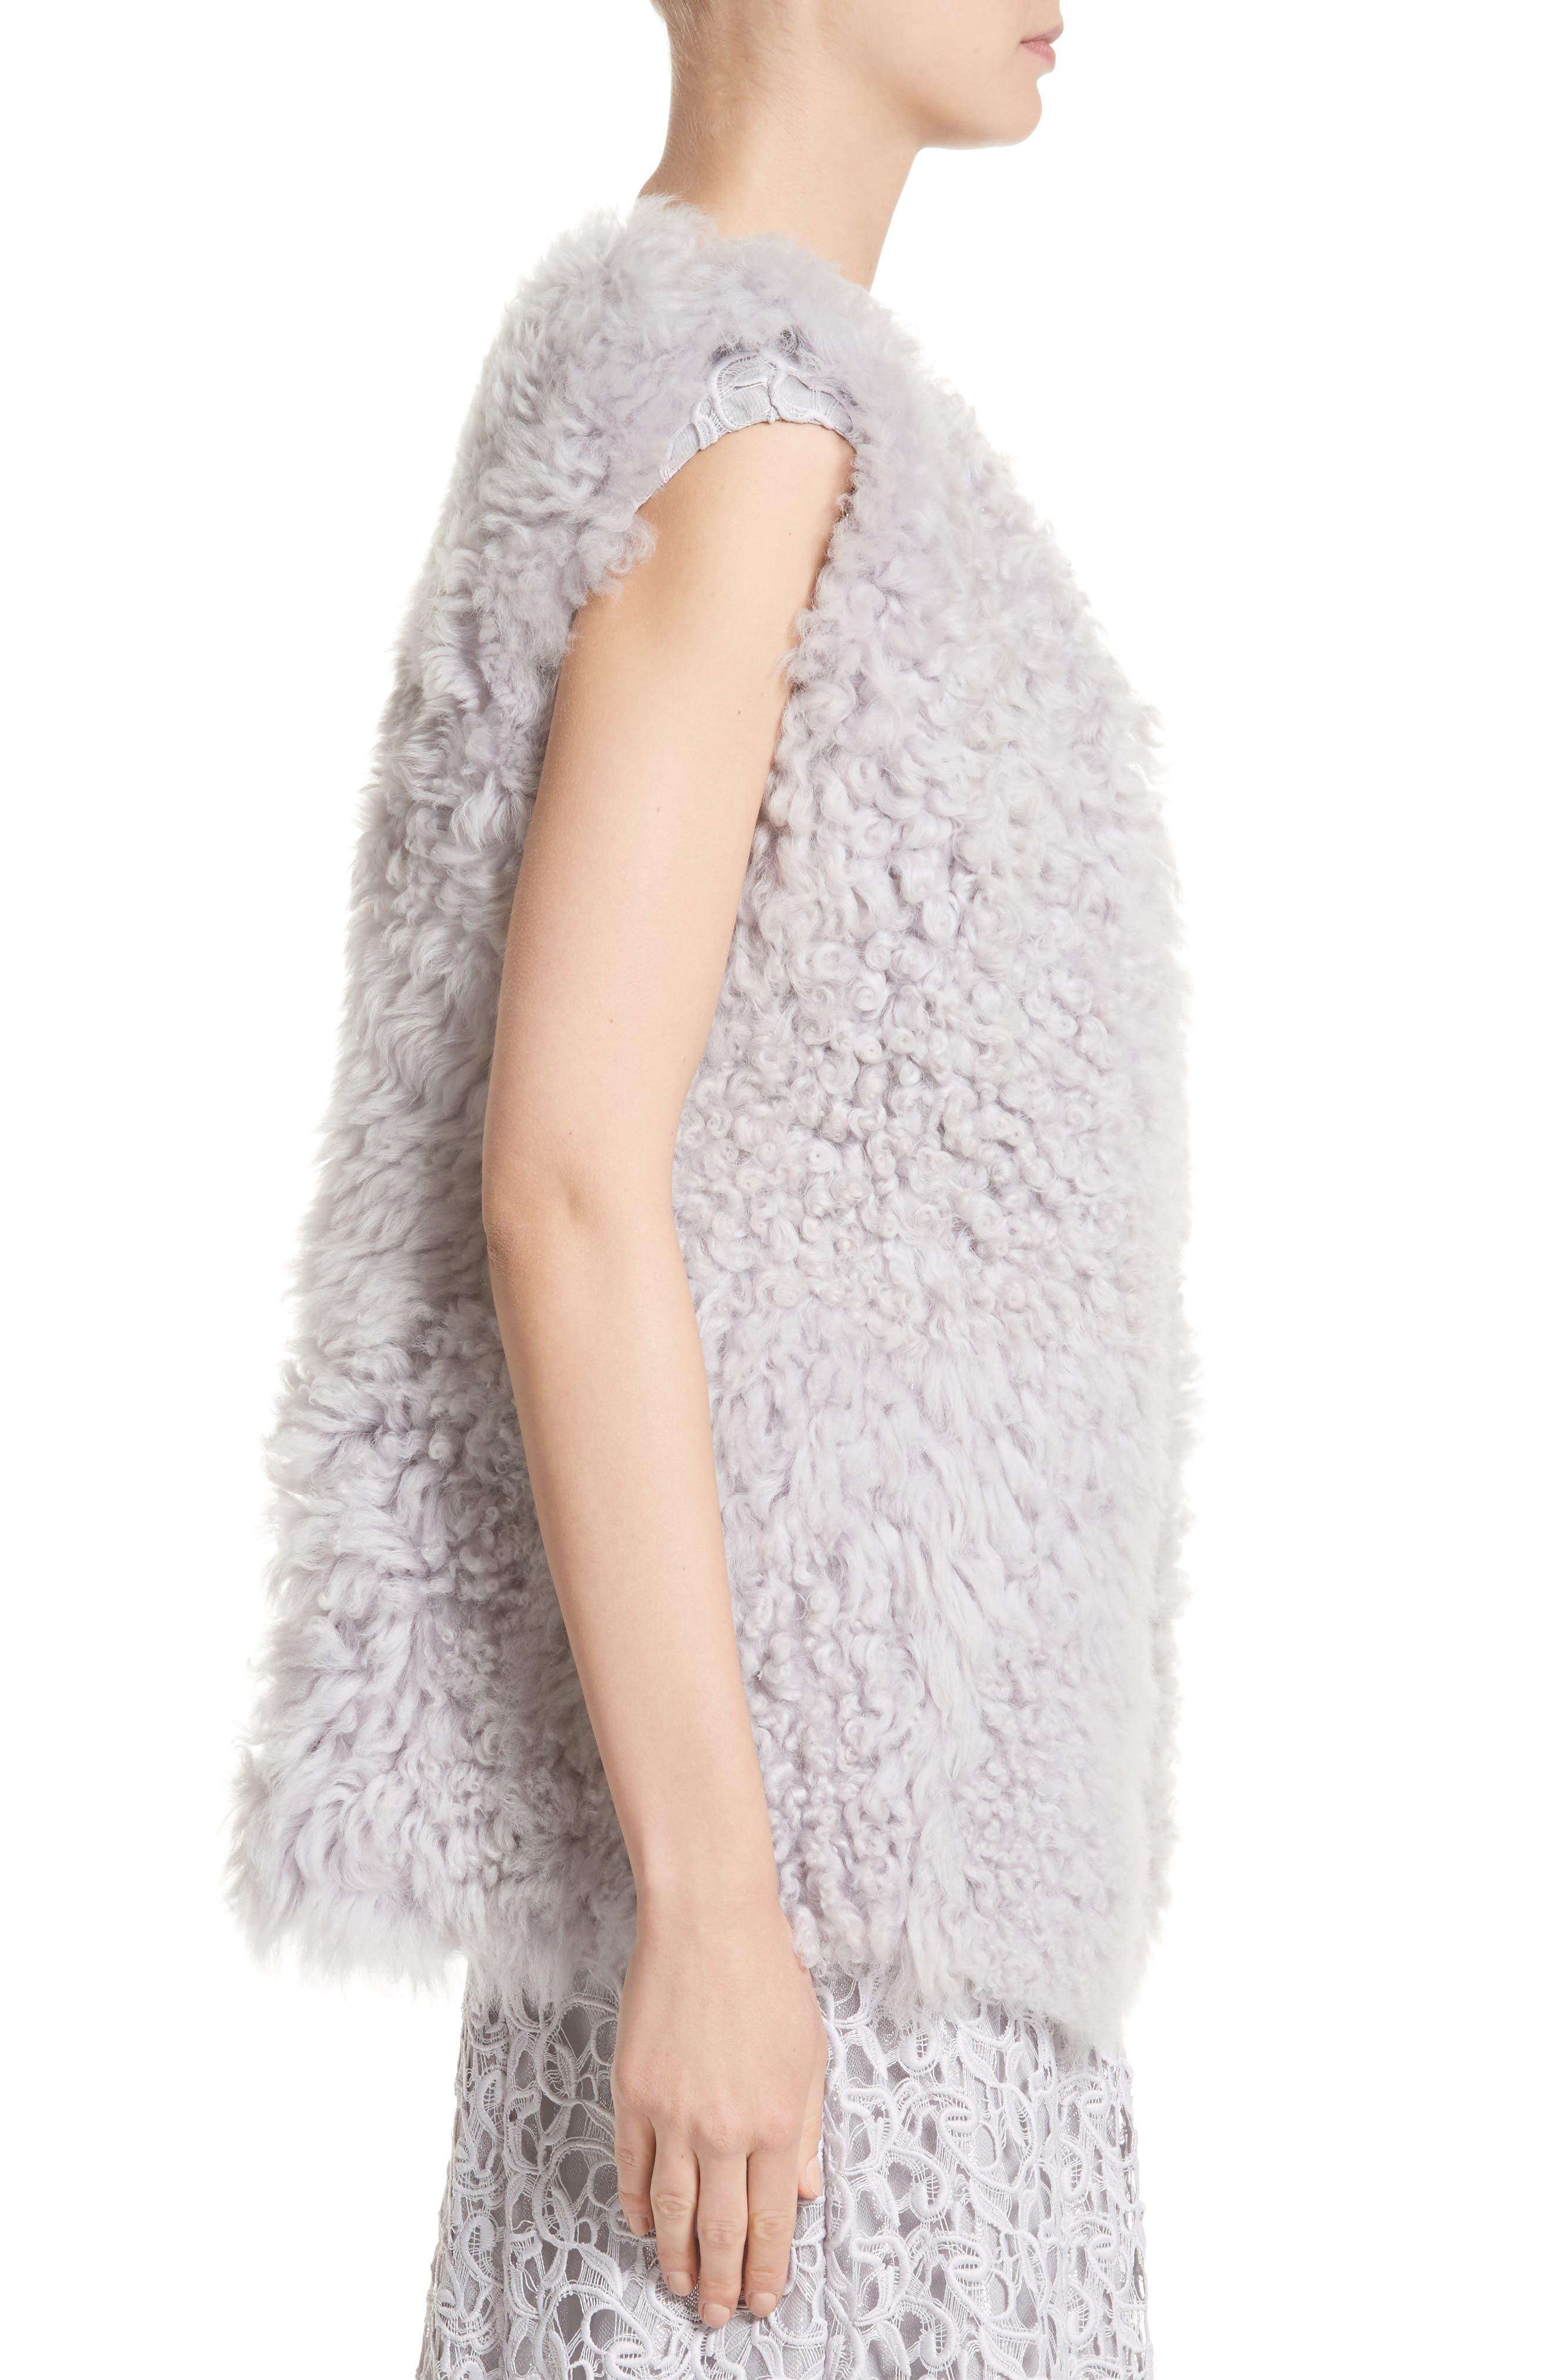 St John Collection Reversible Genuine Curly Lamb Fur Vest,                             Alternate thumbnail 4, color,                             500